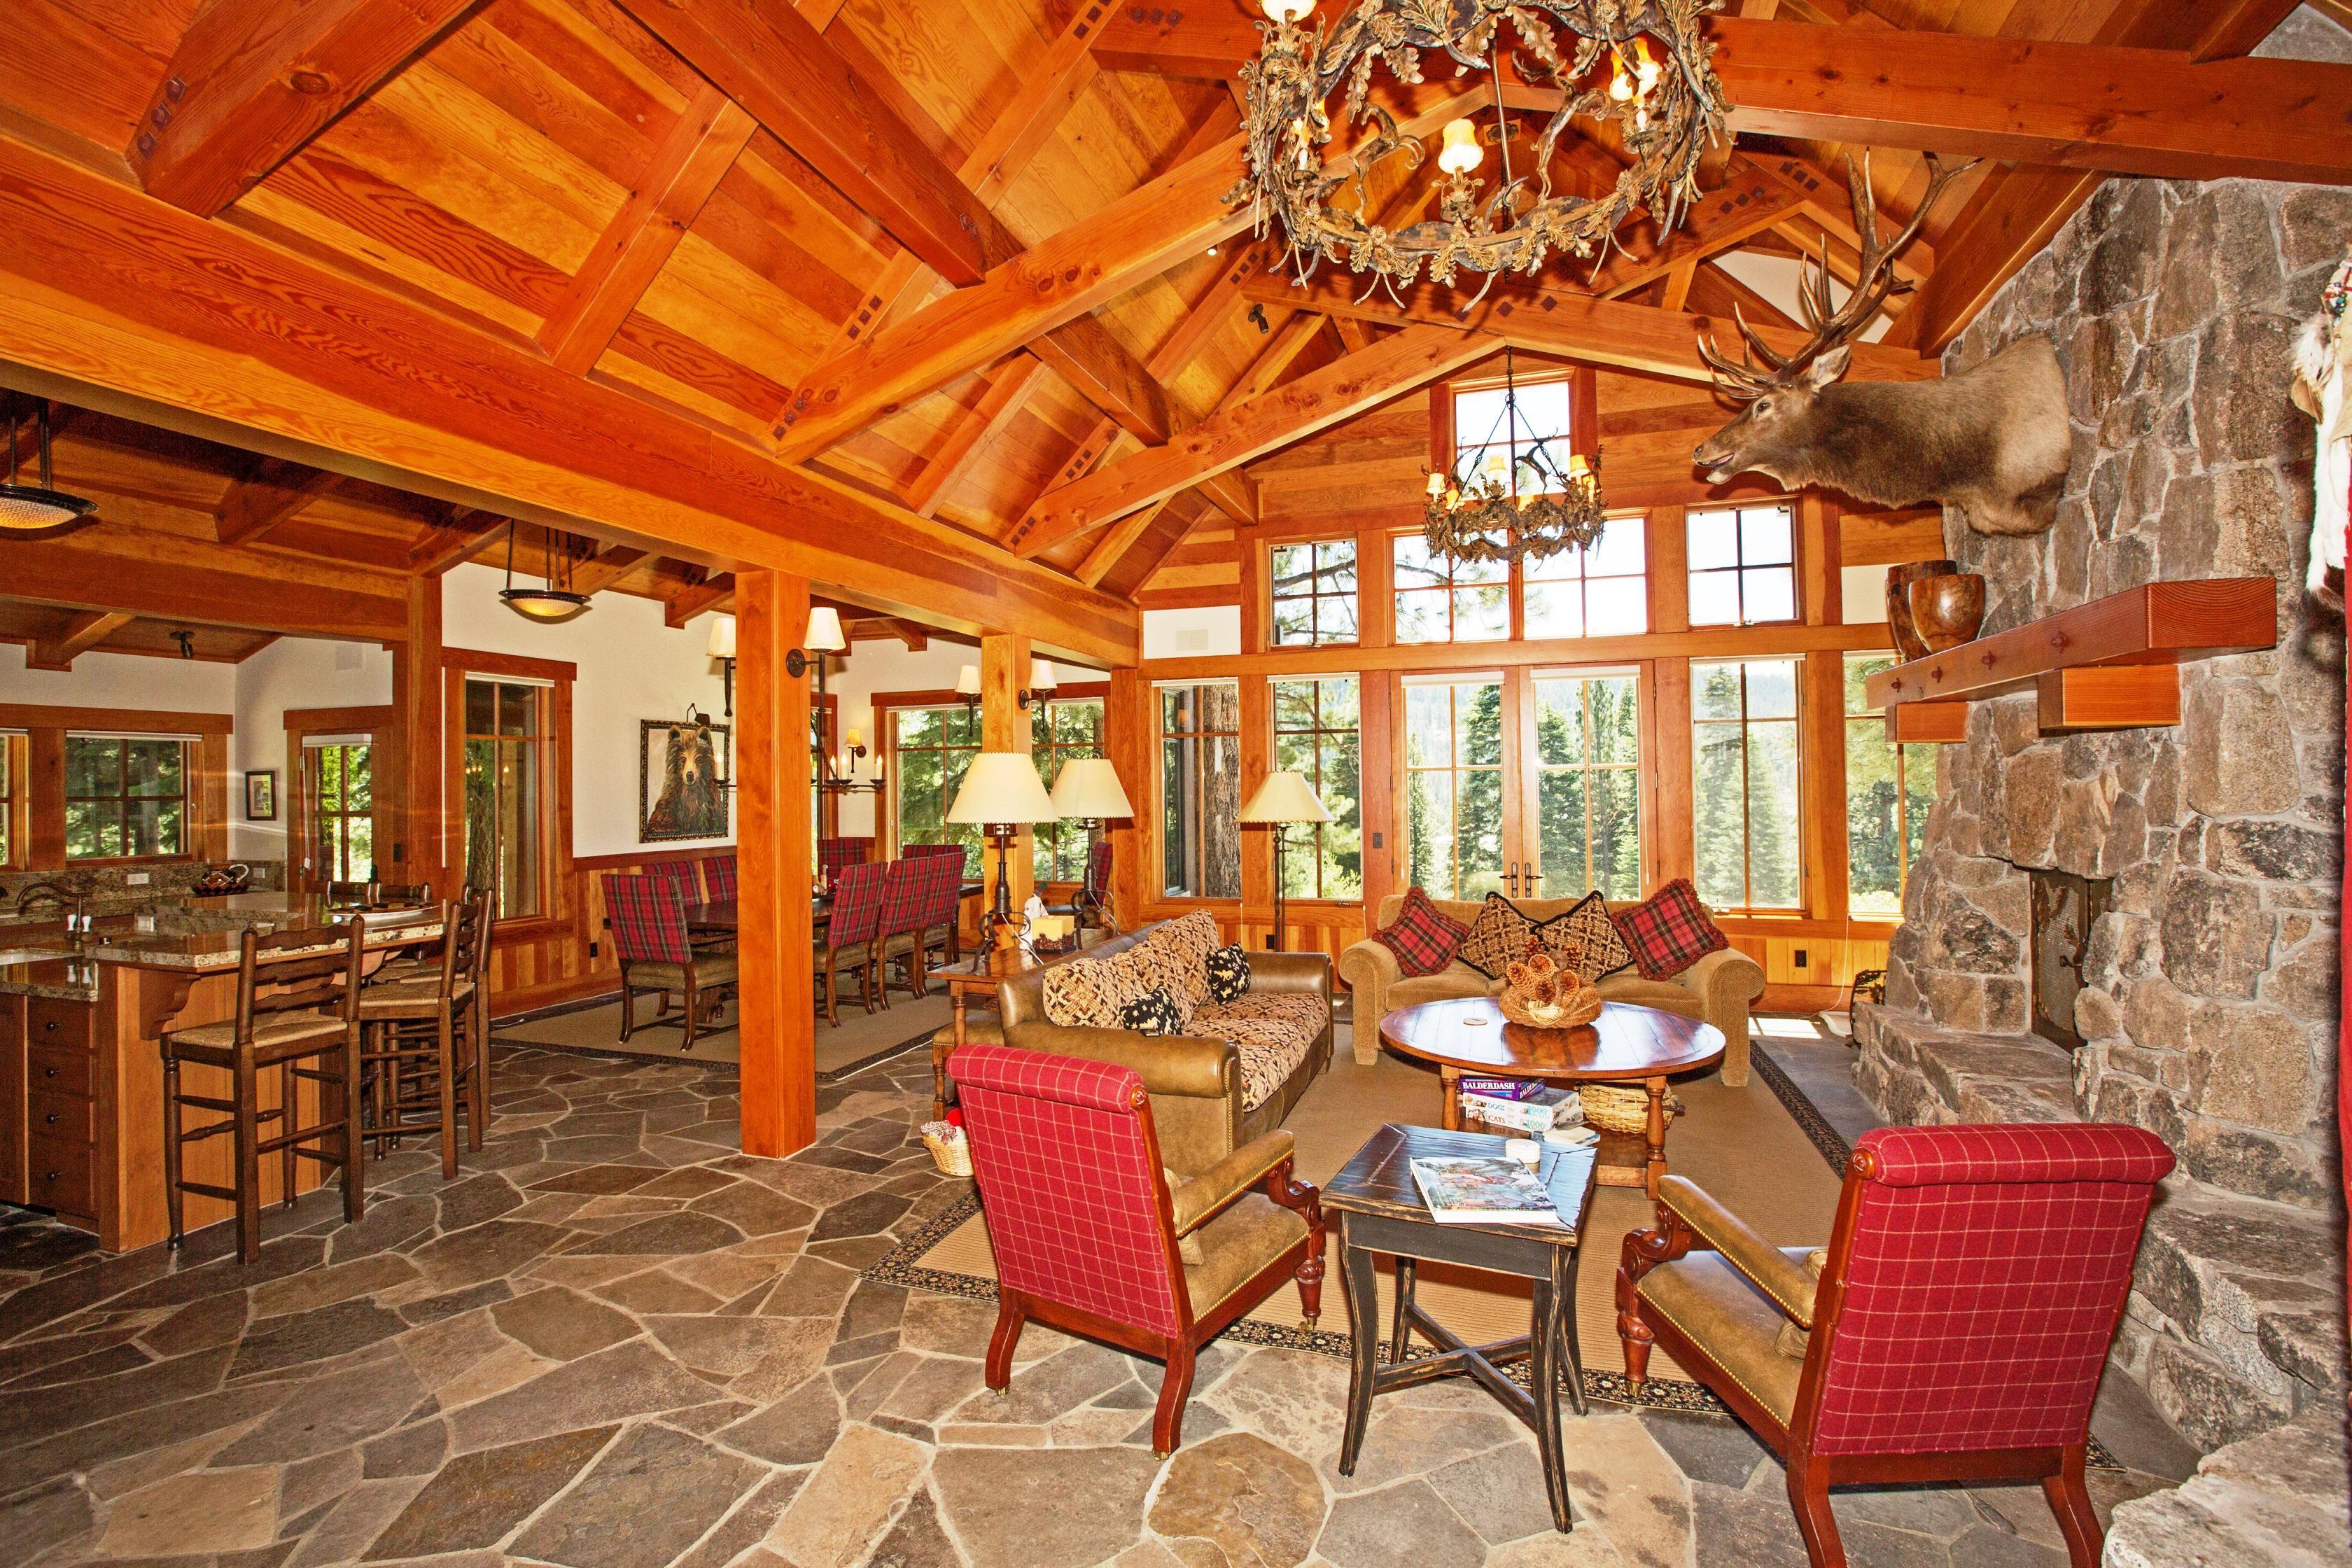 ca lake bd cabins cabin unit pines vacasa rental in vacation tahoe homewood rentals